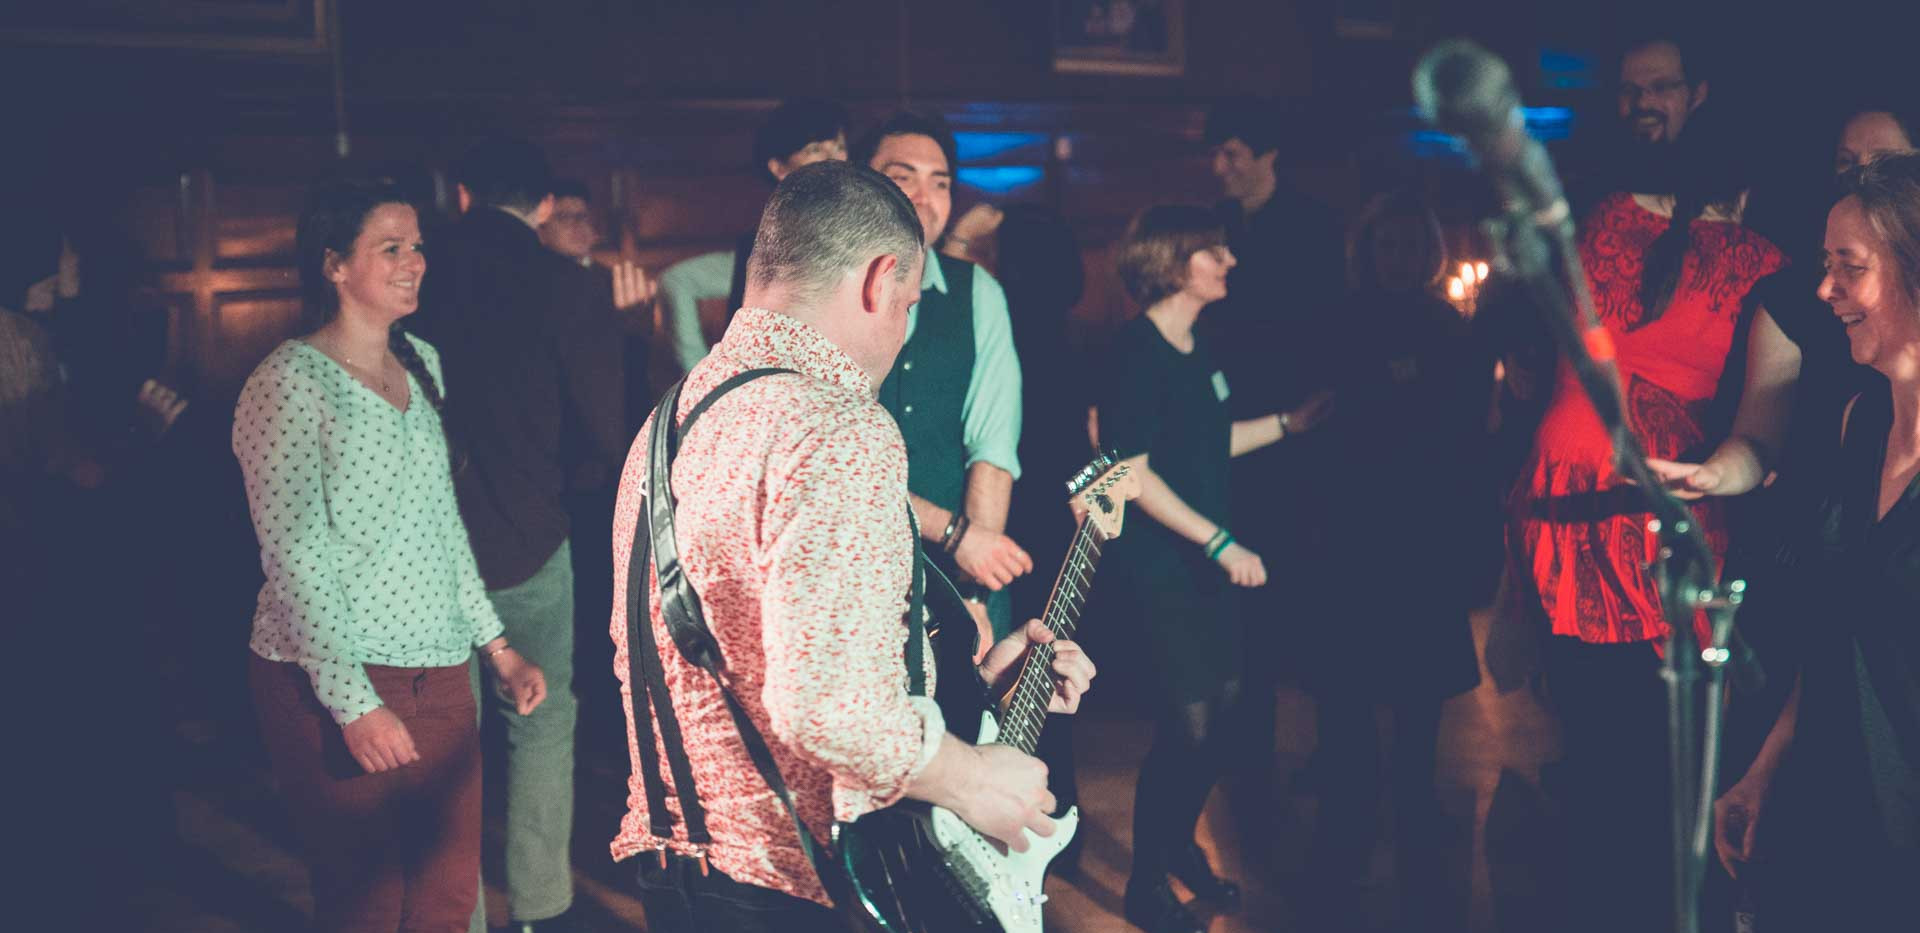 James Robinson, guitarist for Playback in Cambridge